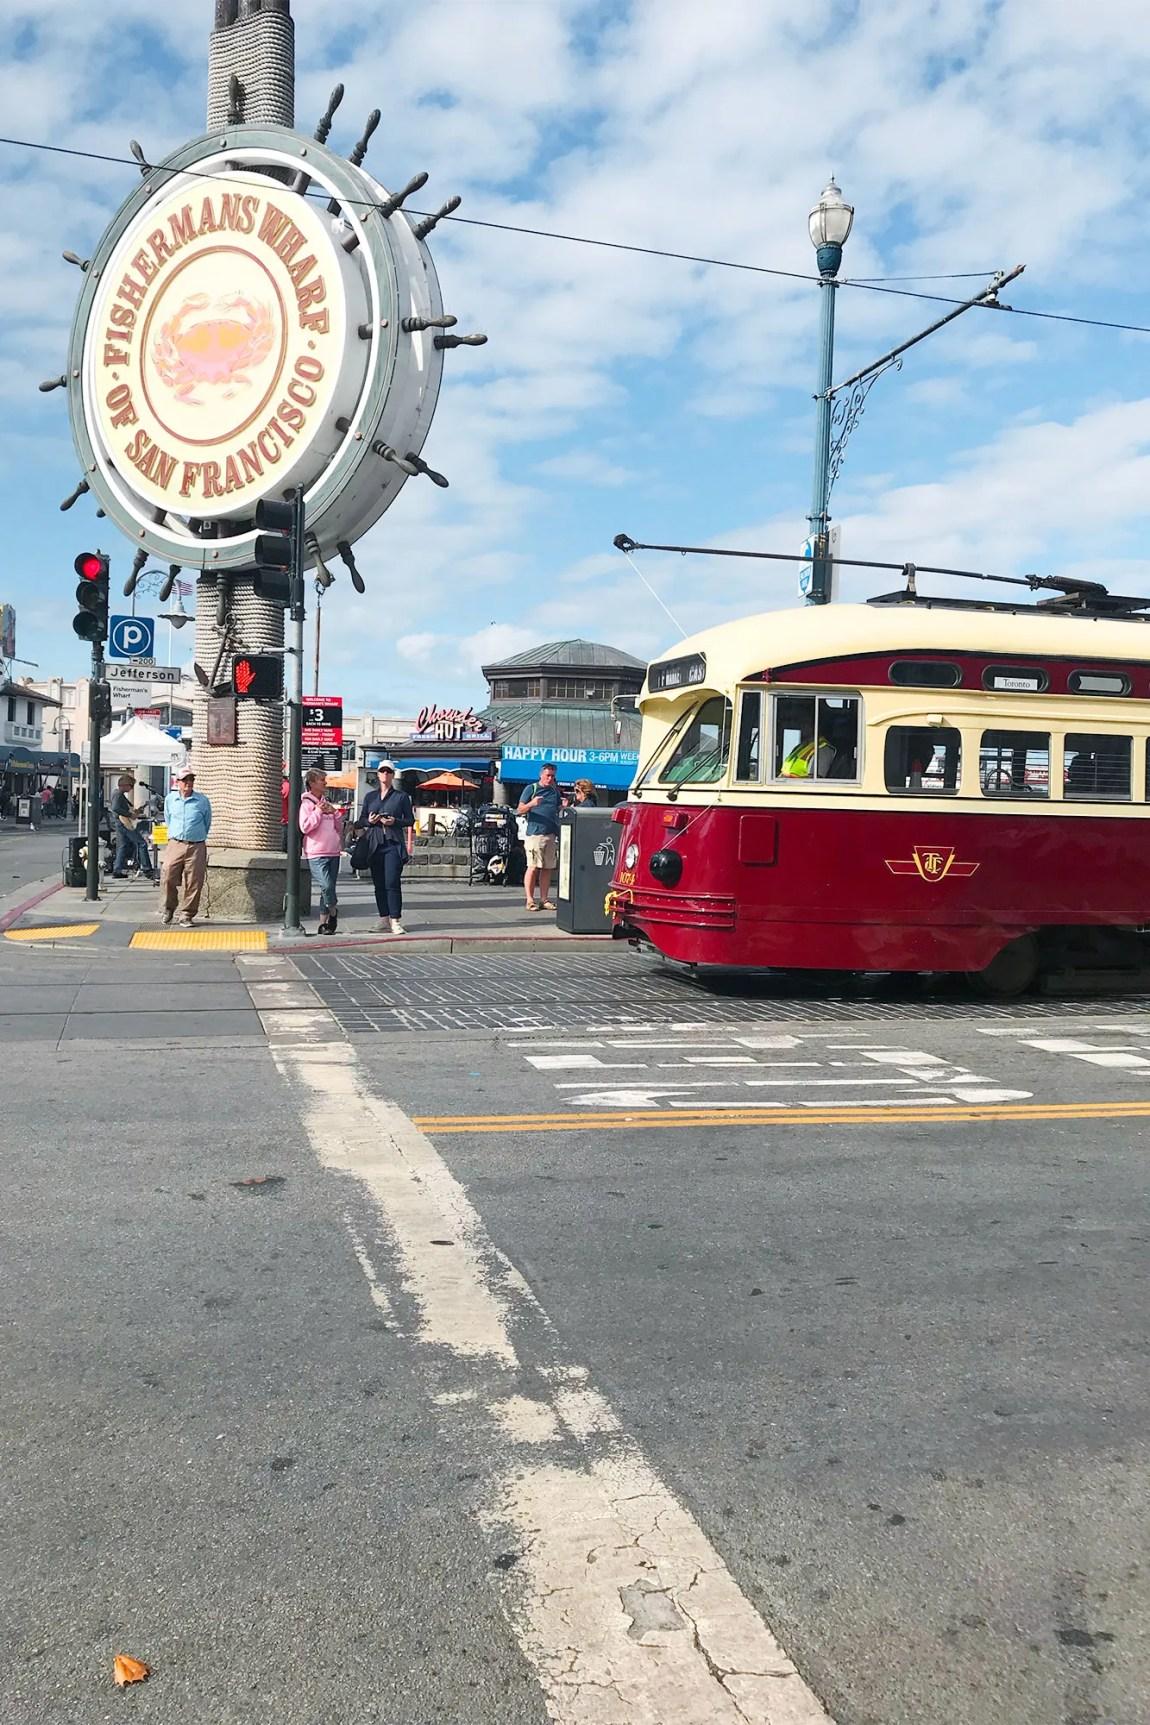 Fisherman's Wharf in San Francisco, California | Local Love and Wanderlust